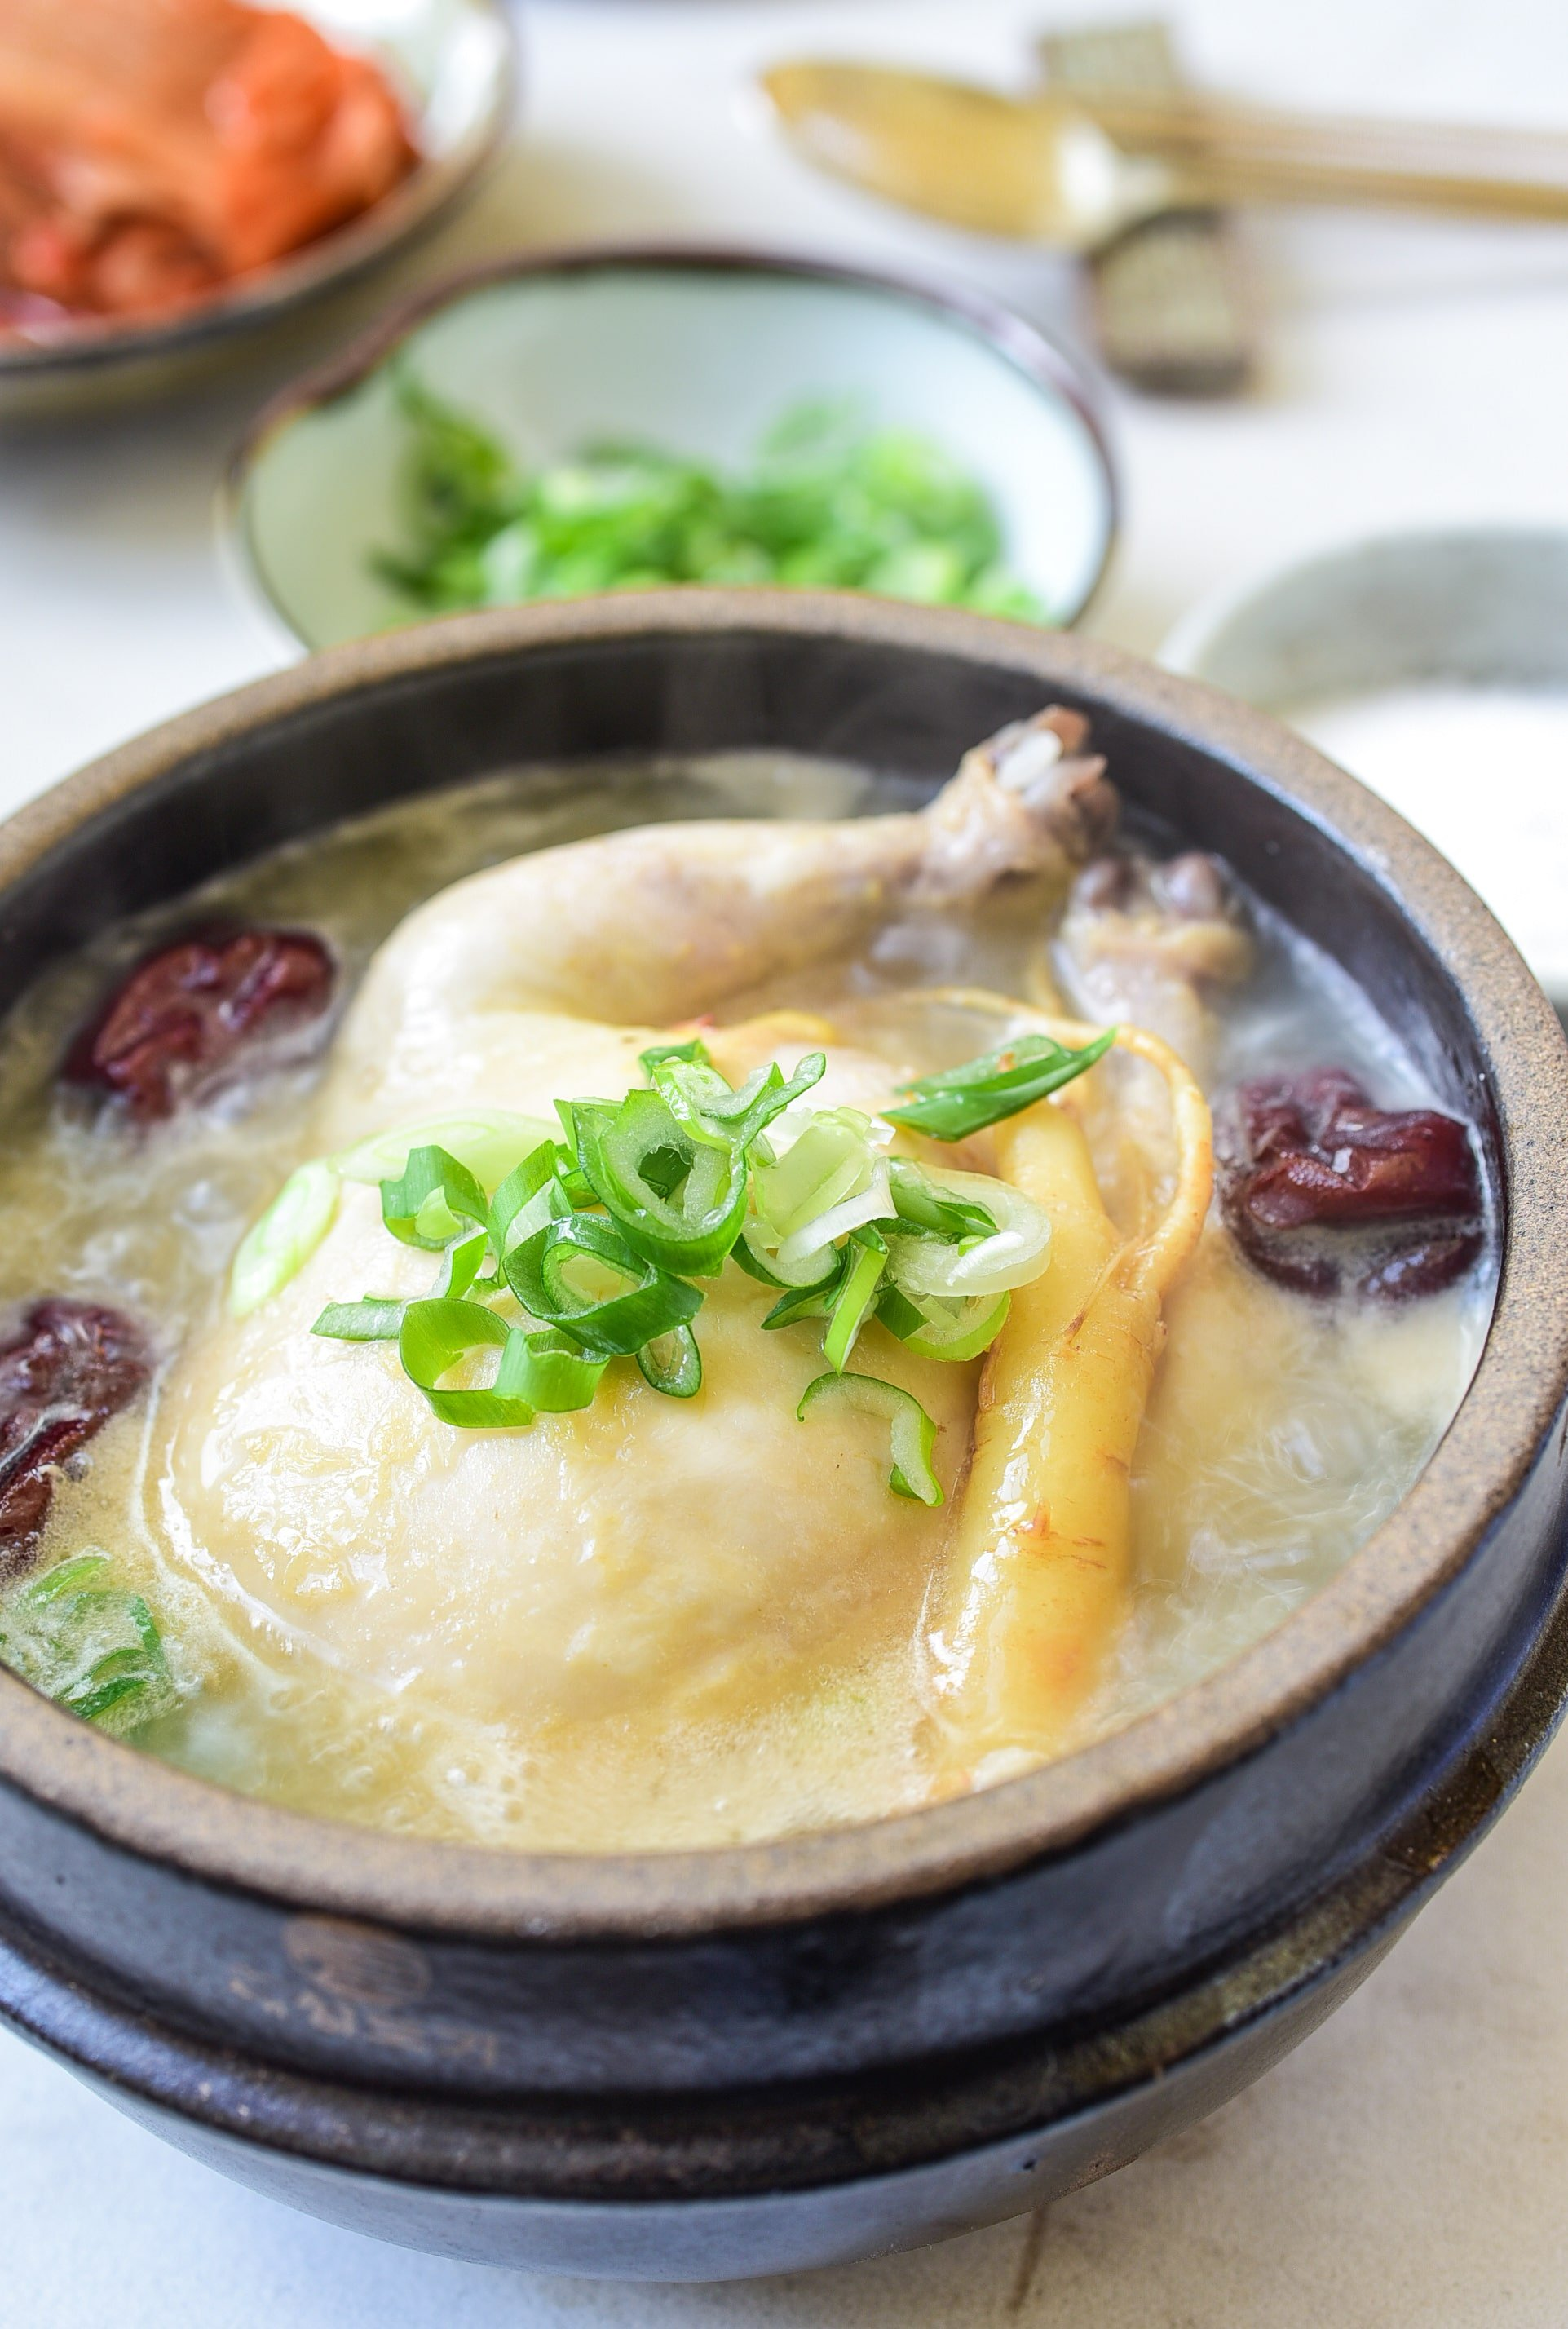 DSC 5082 2 1 - Samgyetang (Ginseng Chicken Soup)